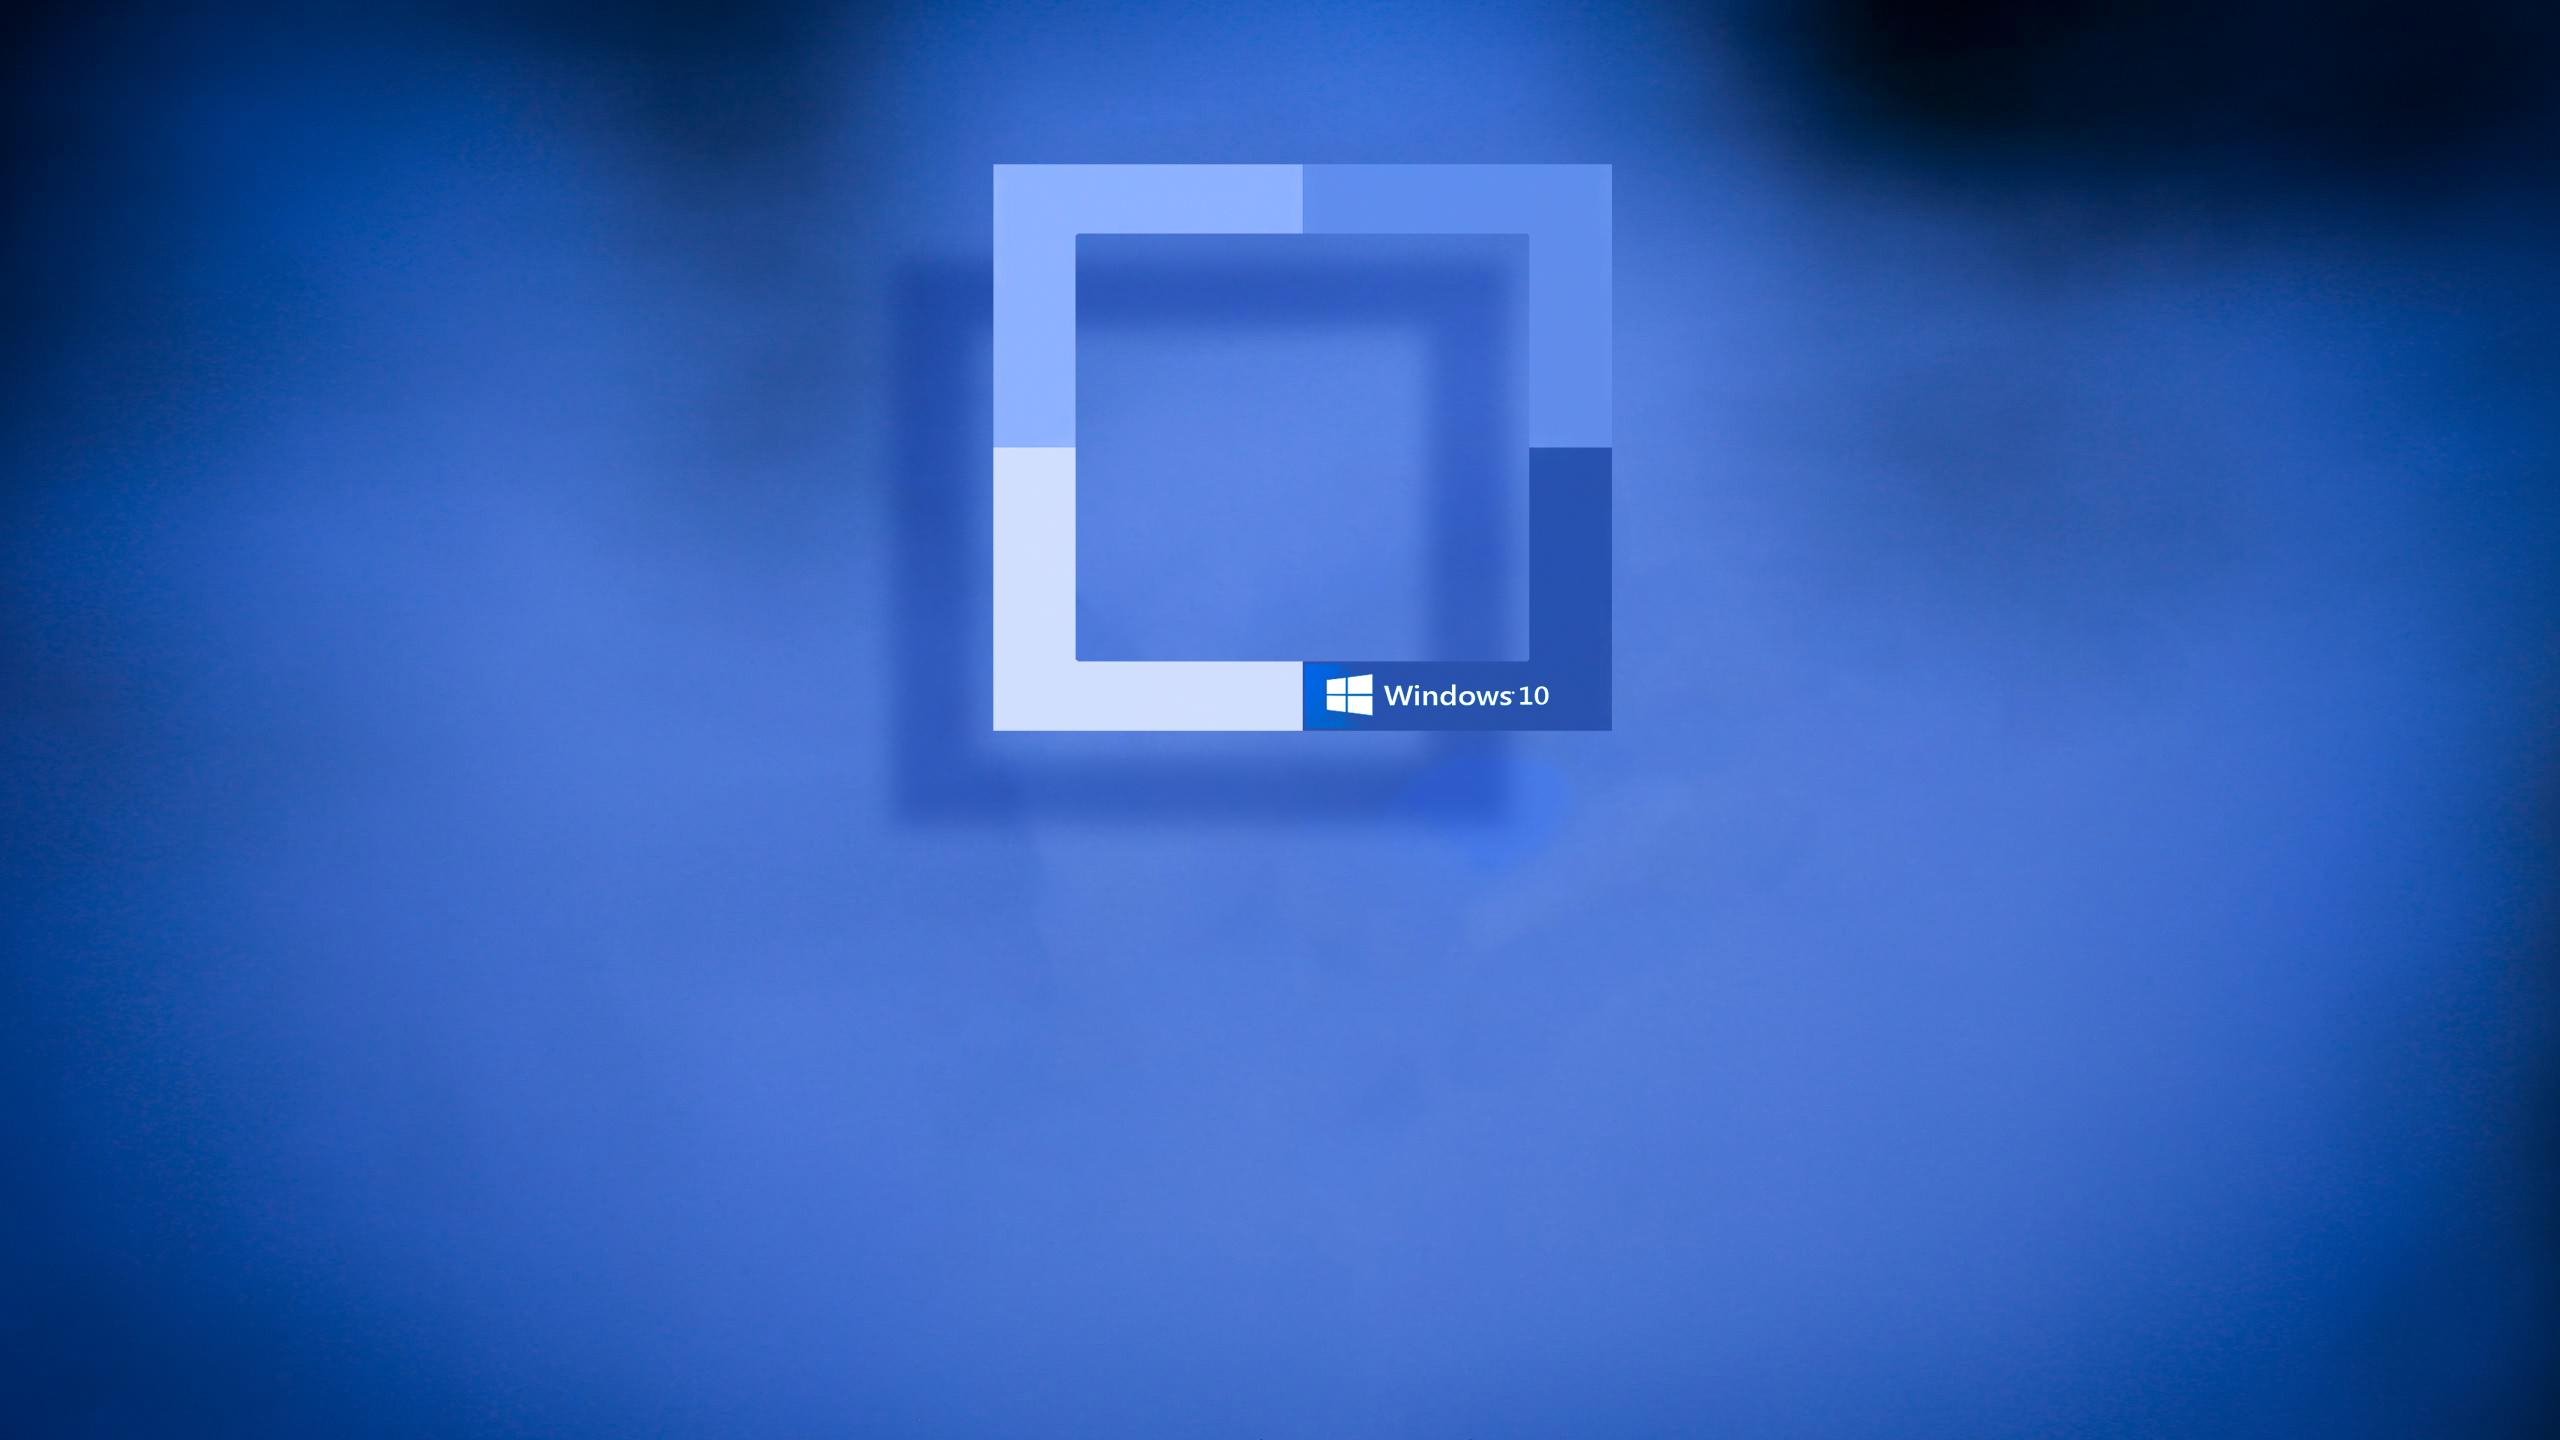 Windows 10 Wallpapers Desktop Backgrounds   5 windows10 wallpaper 2560x1440